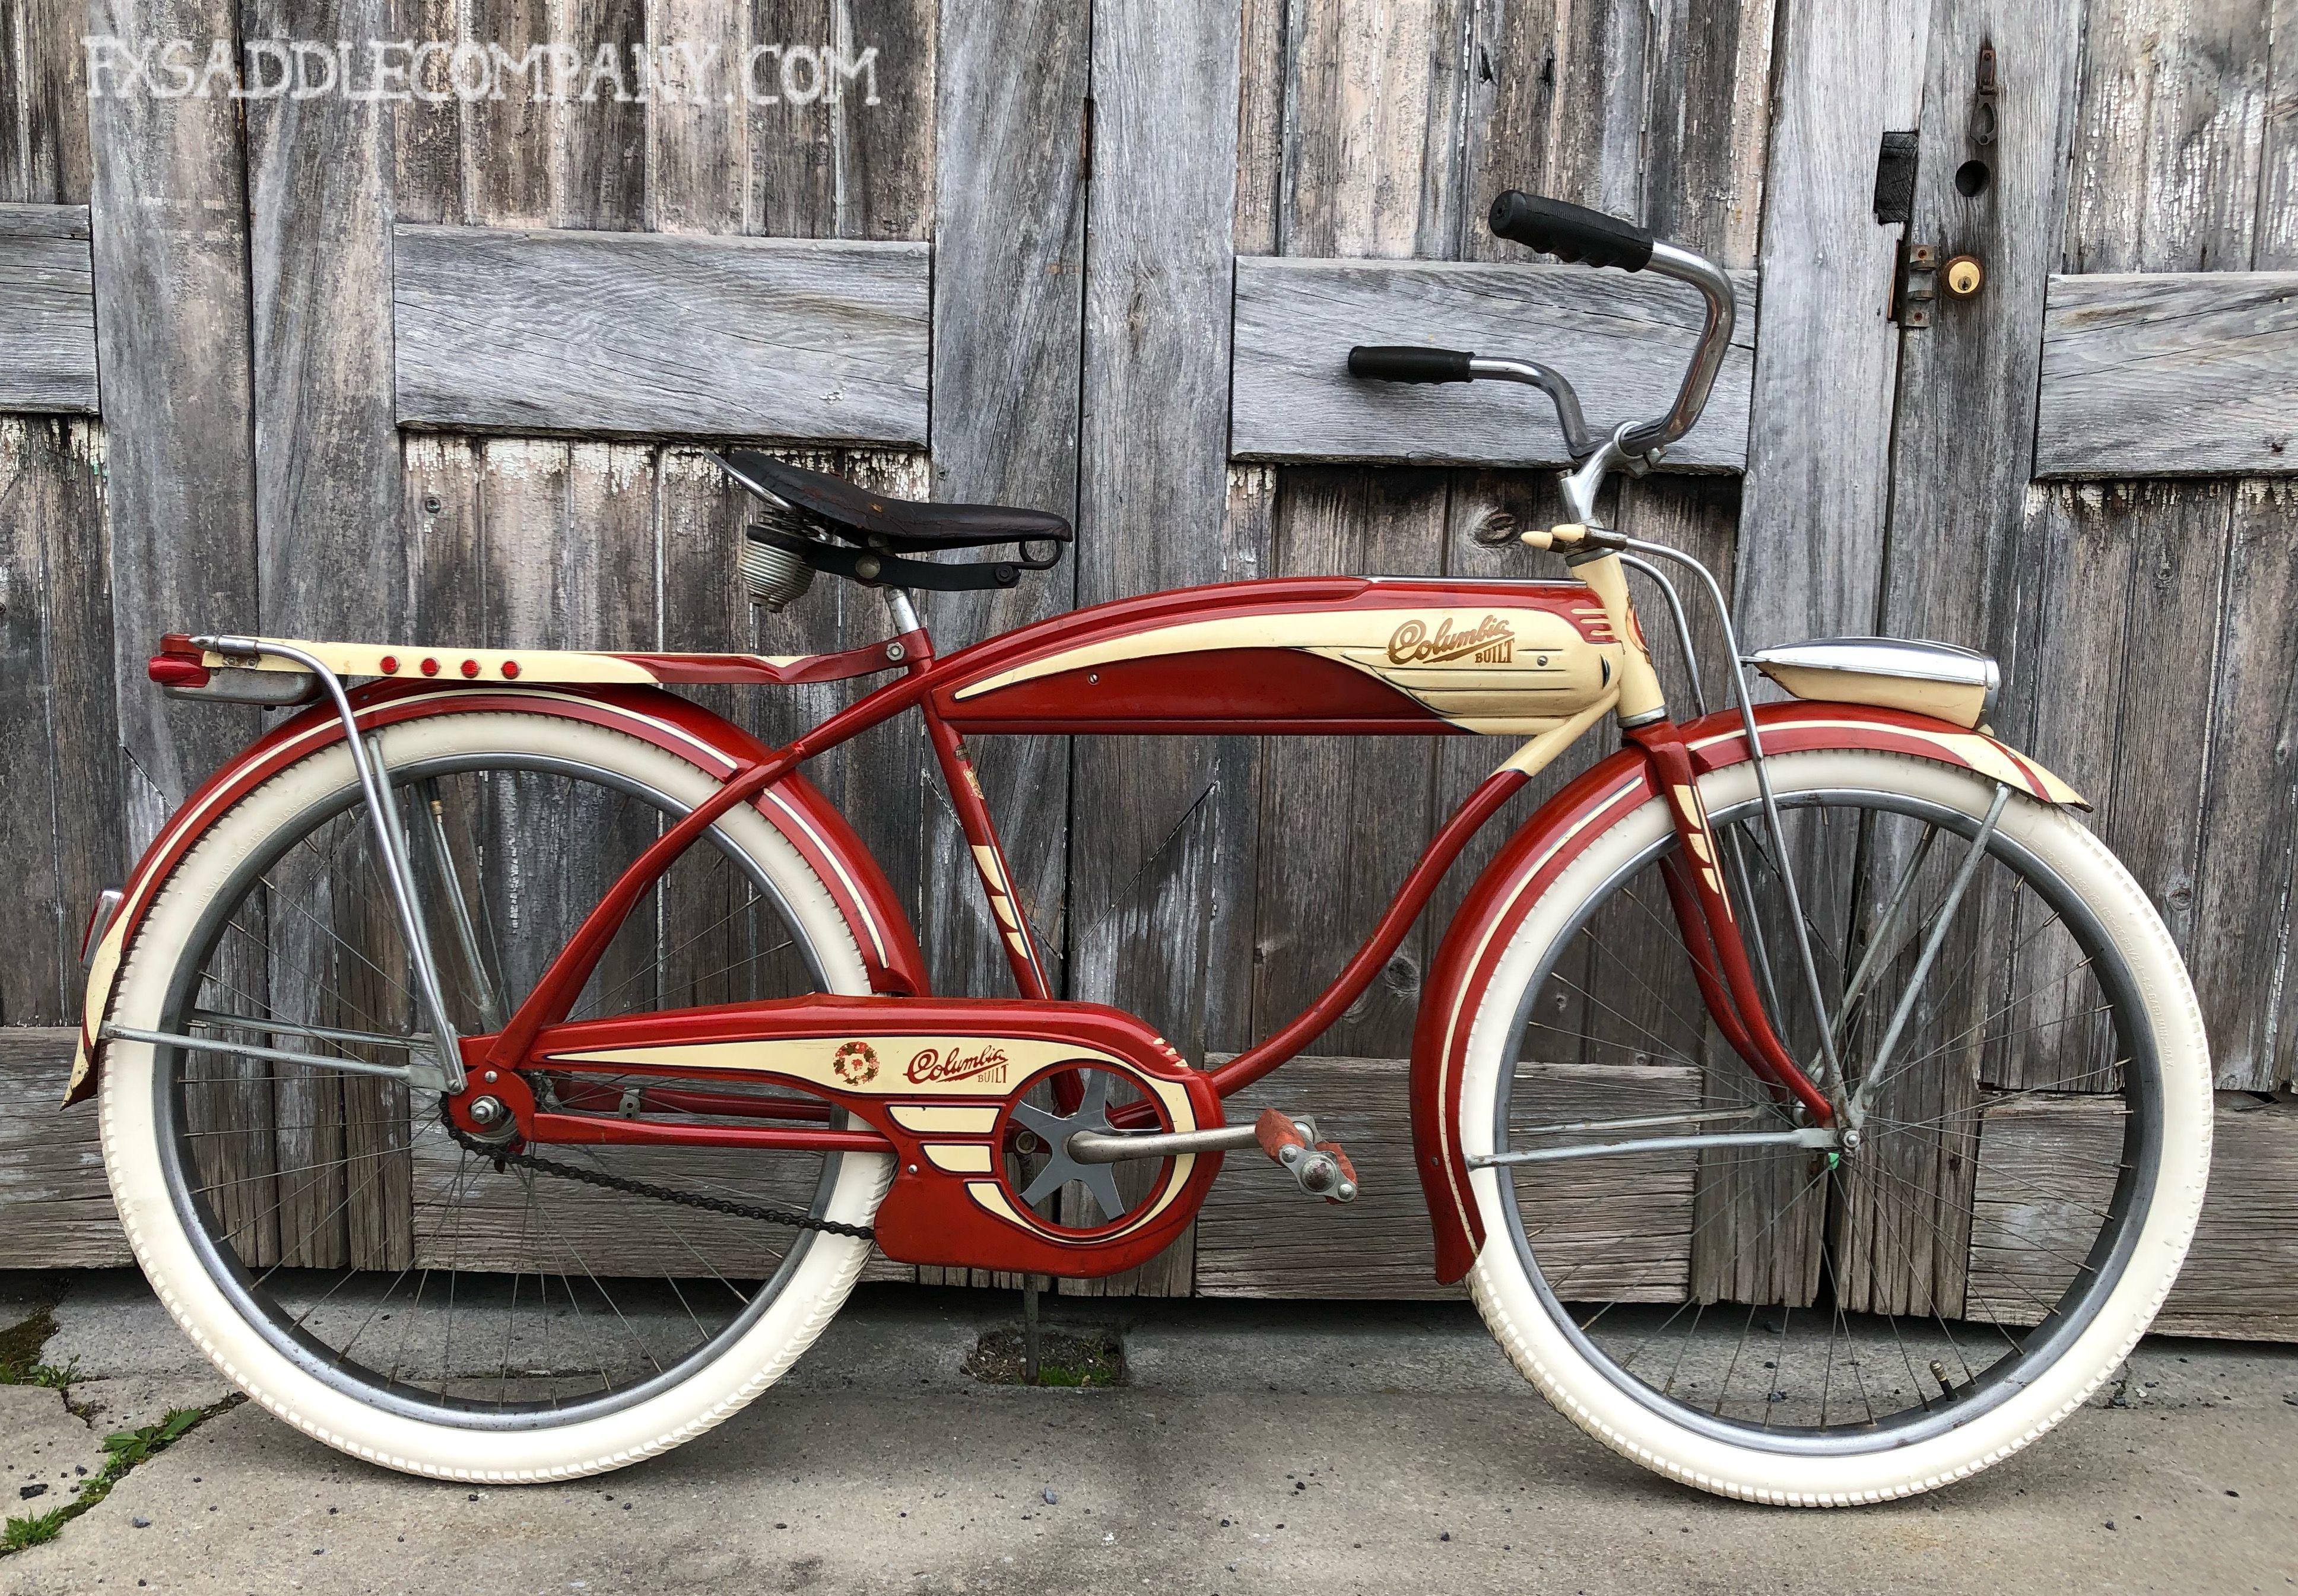 1953 Columbia Five Star Superb Vintage Bicycle In 2020 Vintage Bicycles For Sale Vintage Bicycles Bicycle